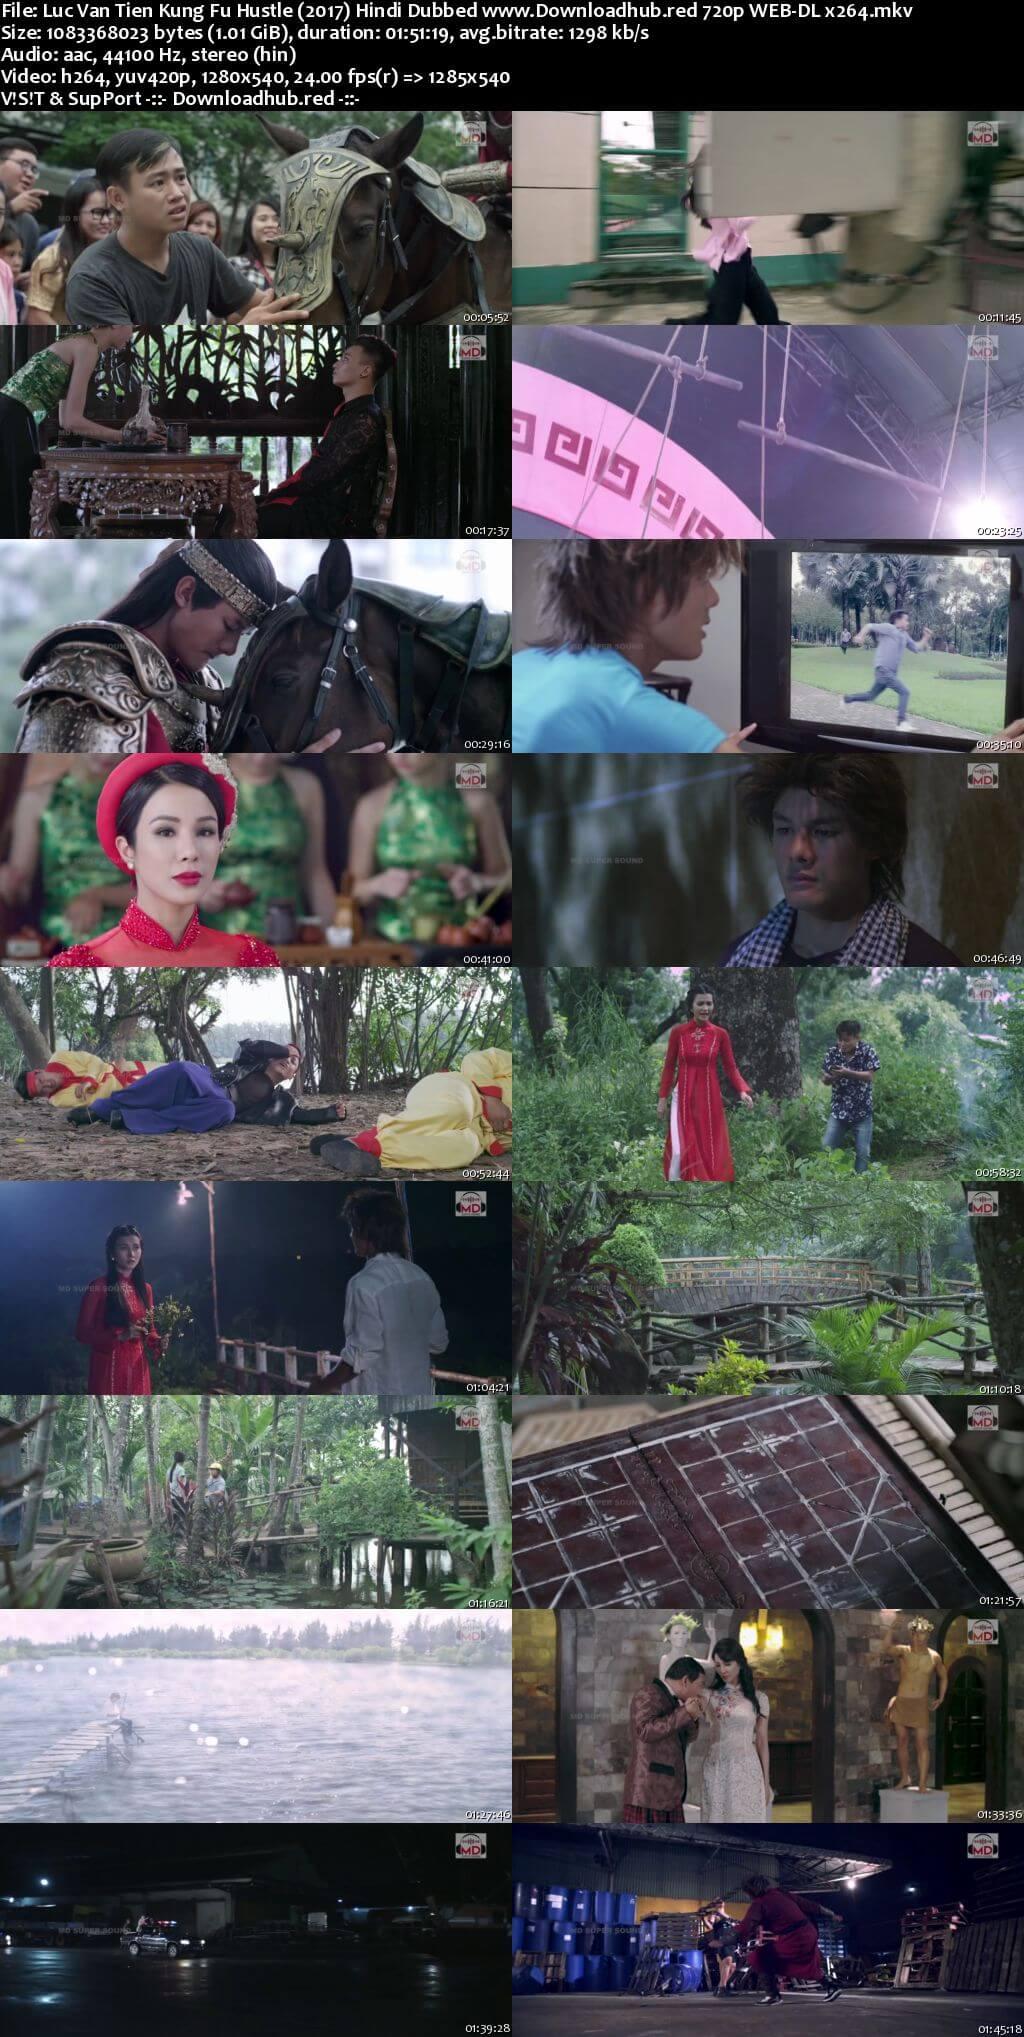 Luc Van Tien Tuyet Dinh Kungfu 2017 Hindi Dubbed 720p HDRip x264